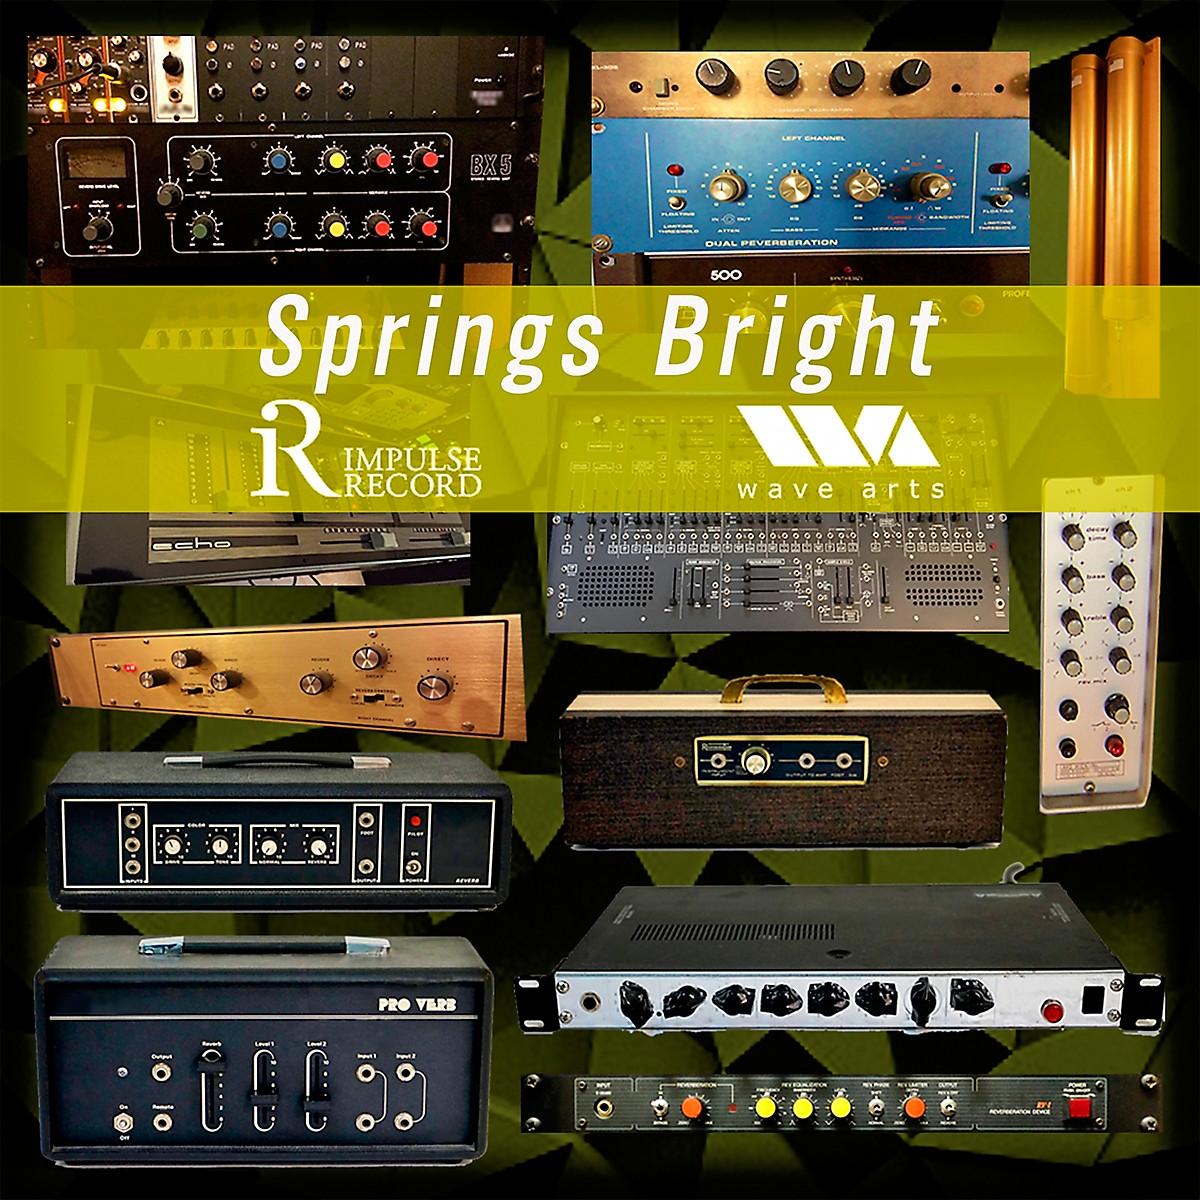 Impulse Record Springs Bright